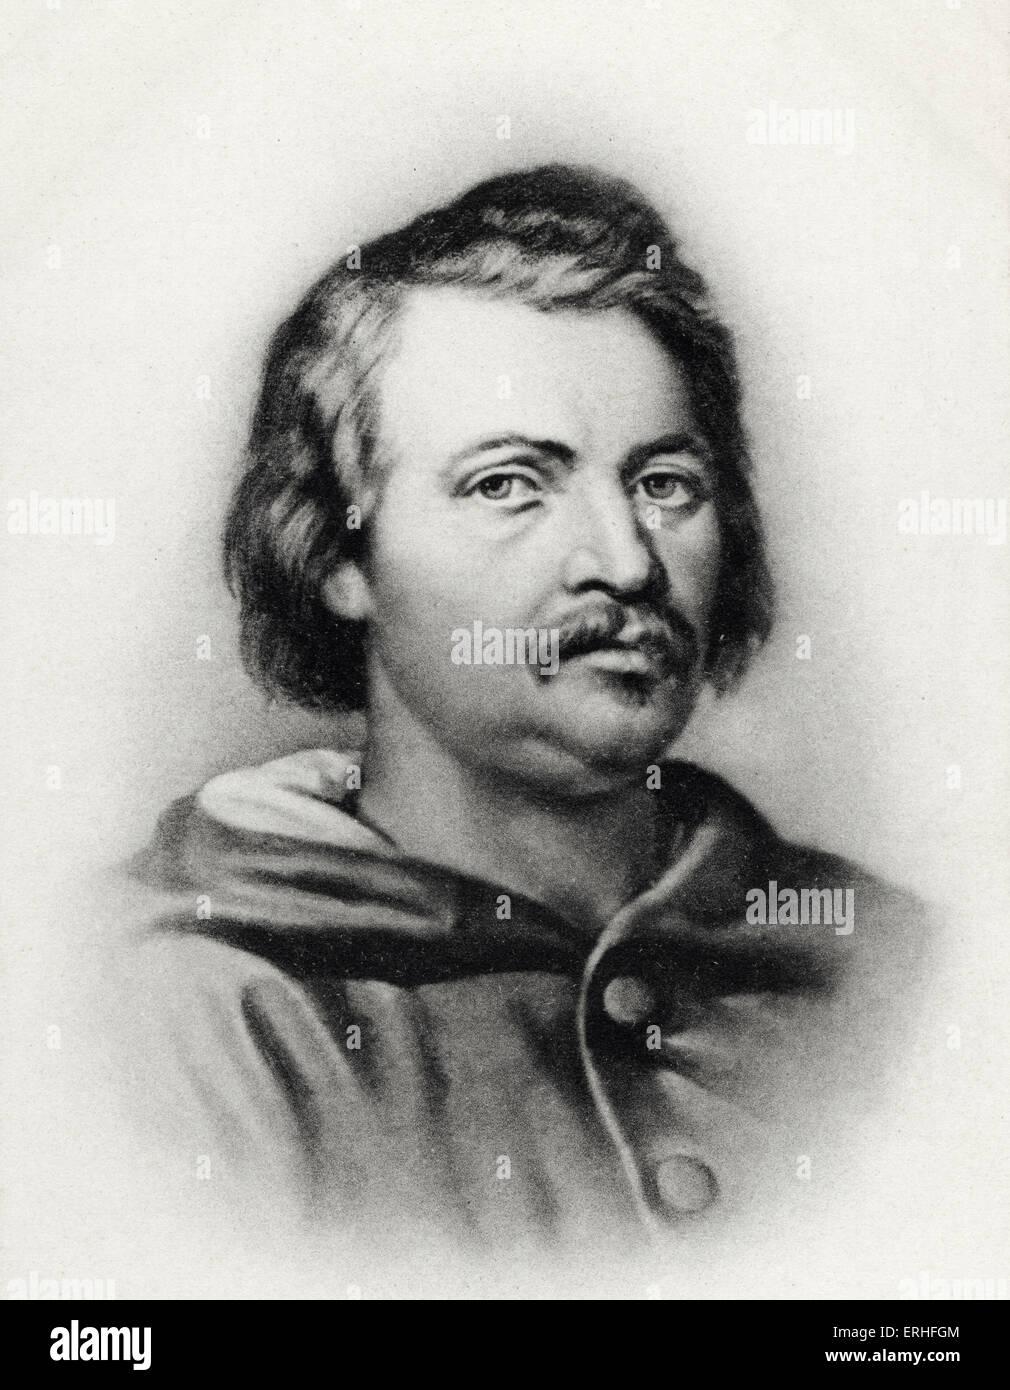 Honoré De Balzac Portrait French Novelist And Poet 20 May